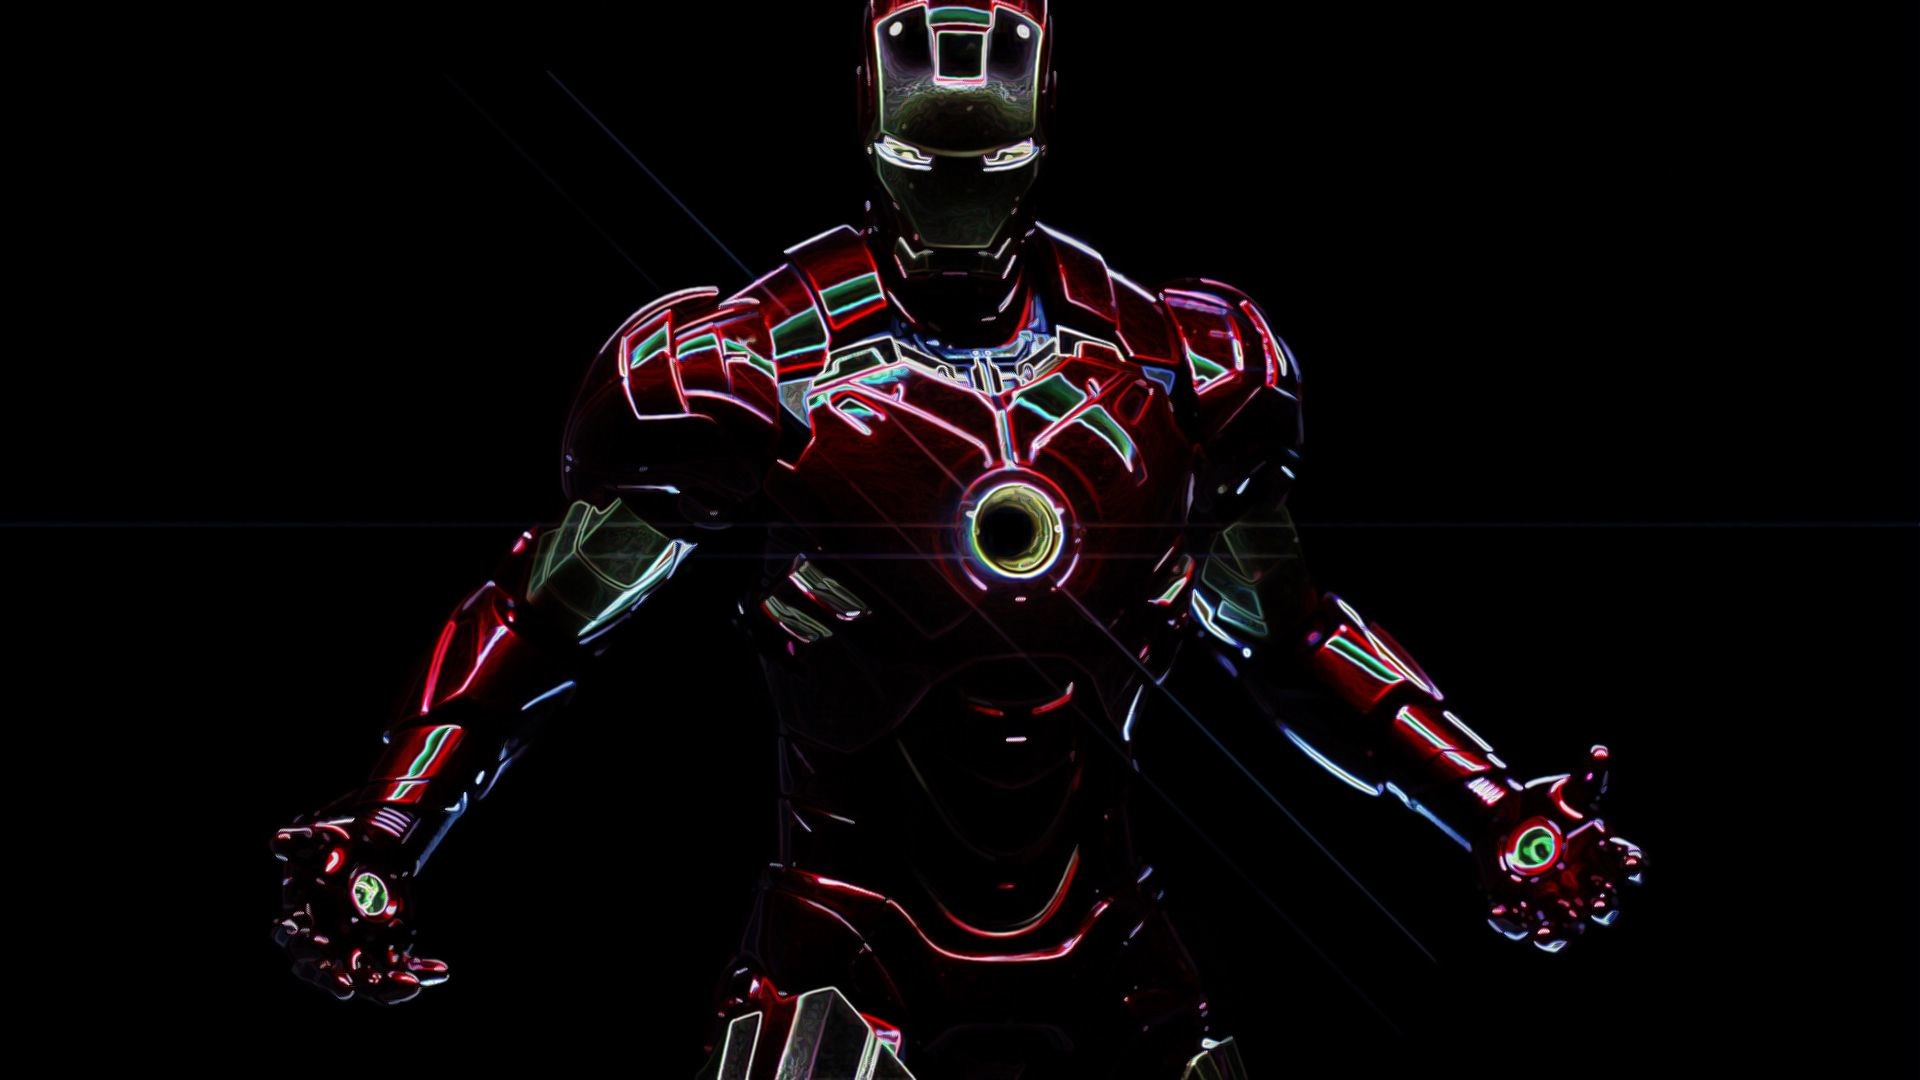 4k wallpaper marvel 46 images - Iron man wallpaper 4k ...